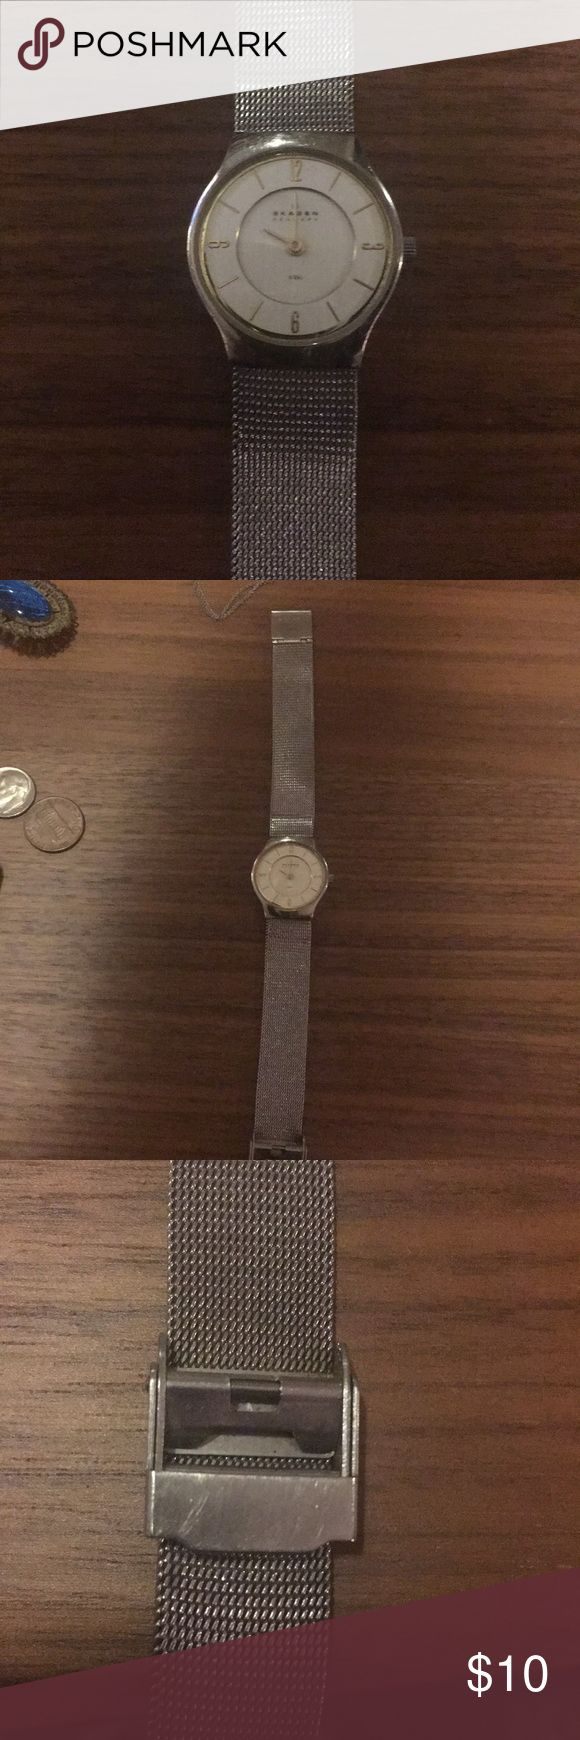 how to change skagen watch battery